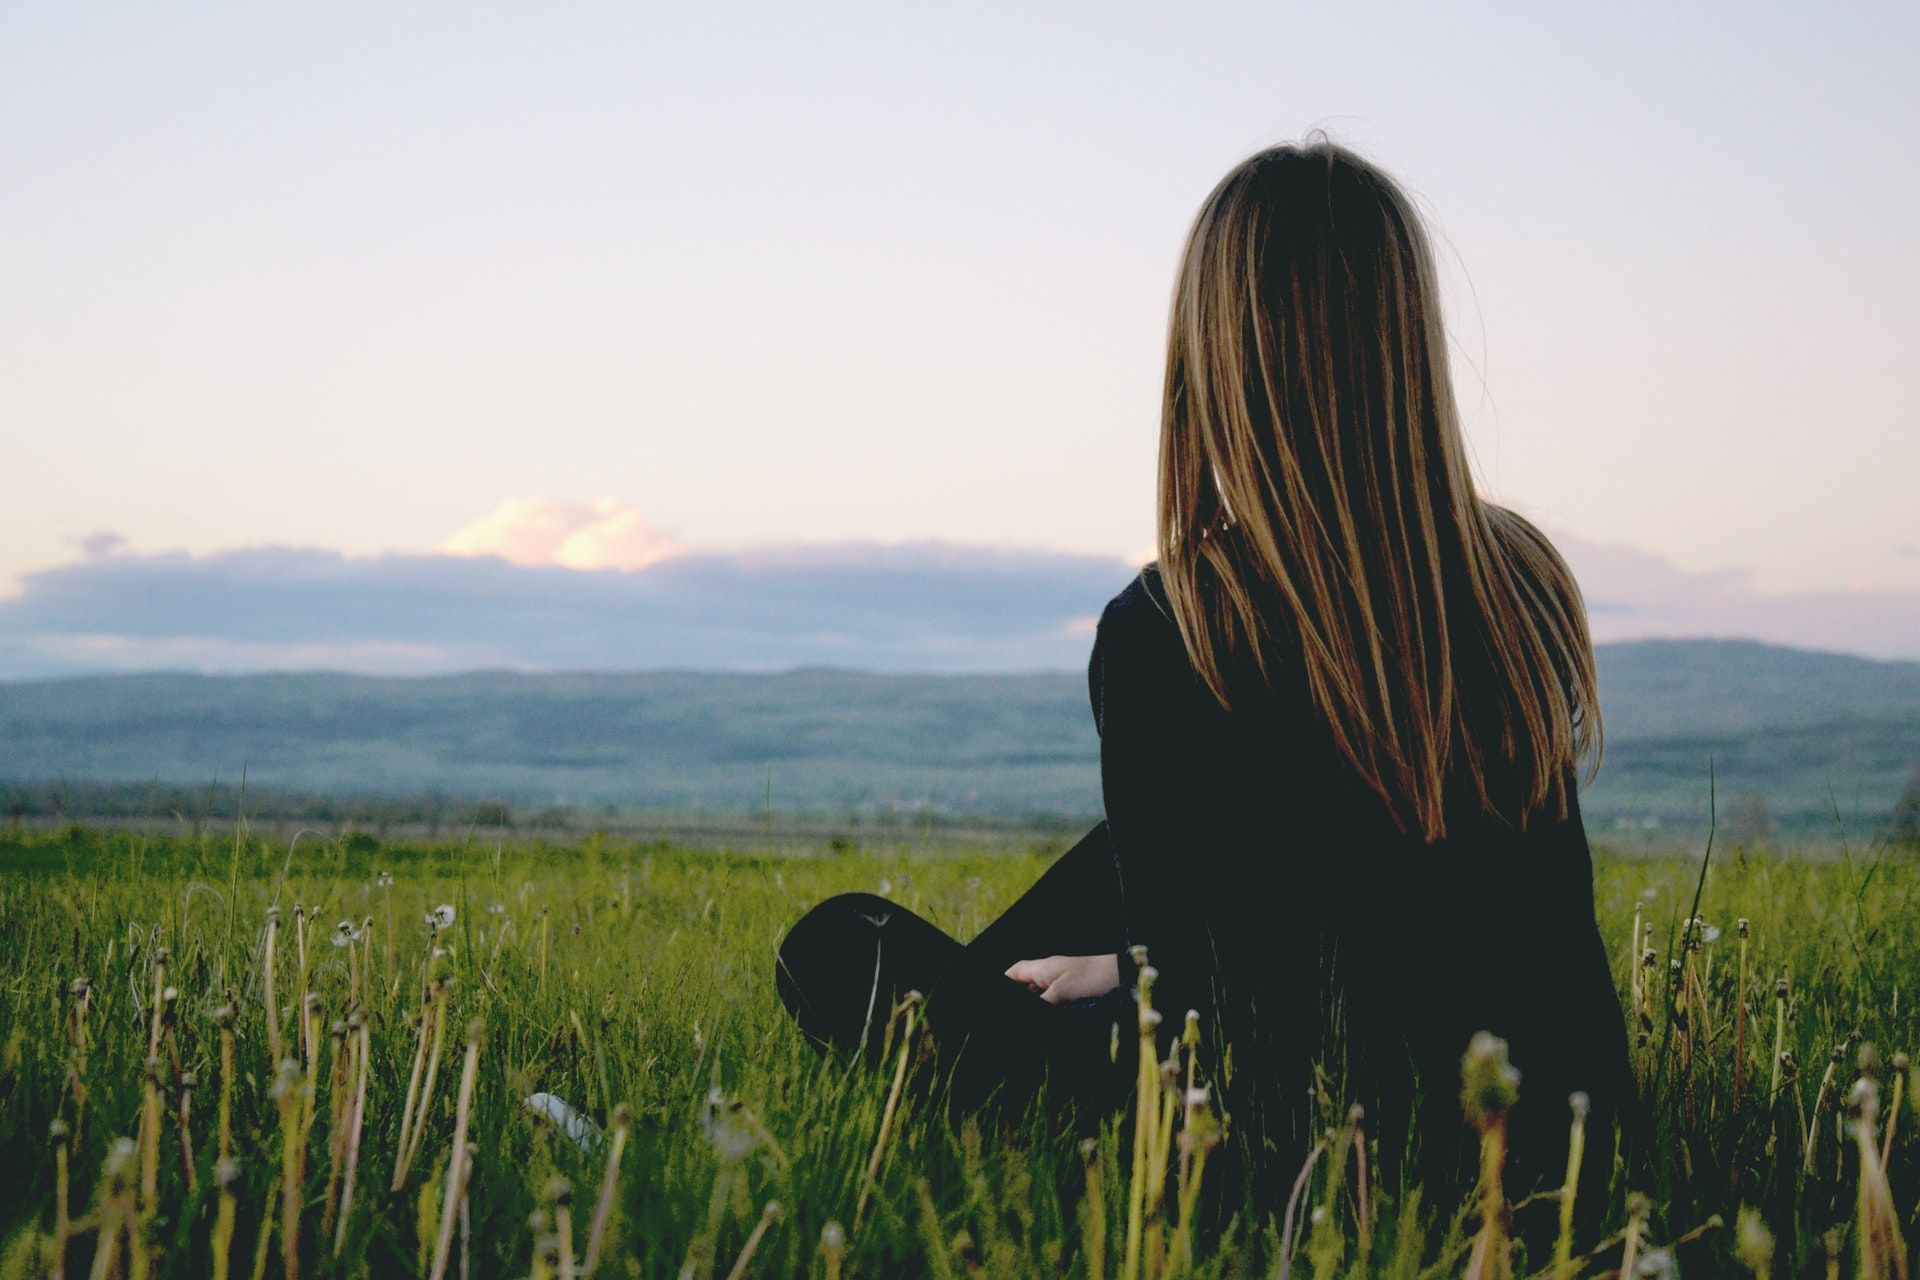 Nainen istuu ruohikossa